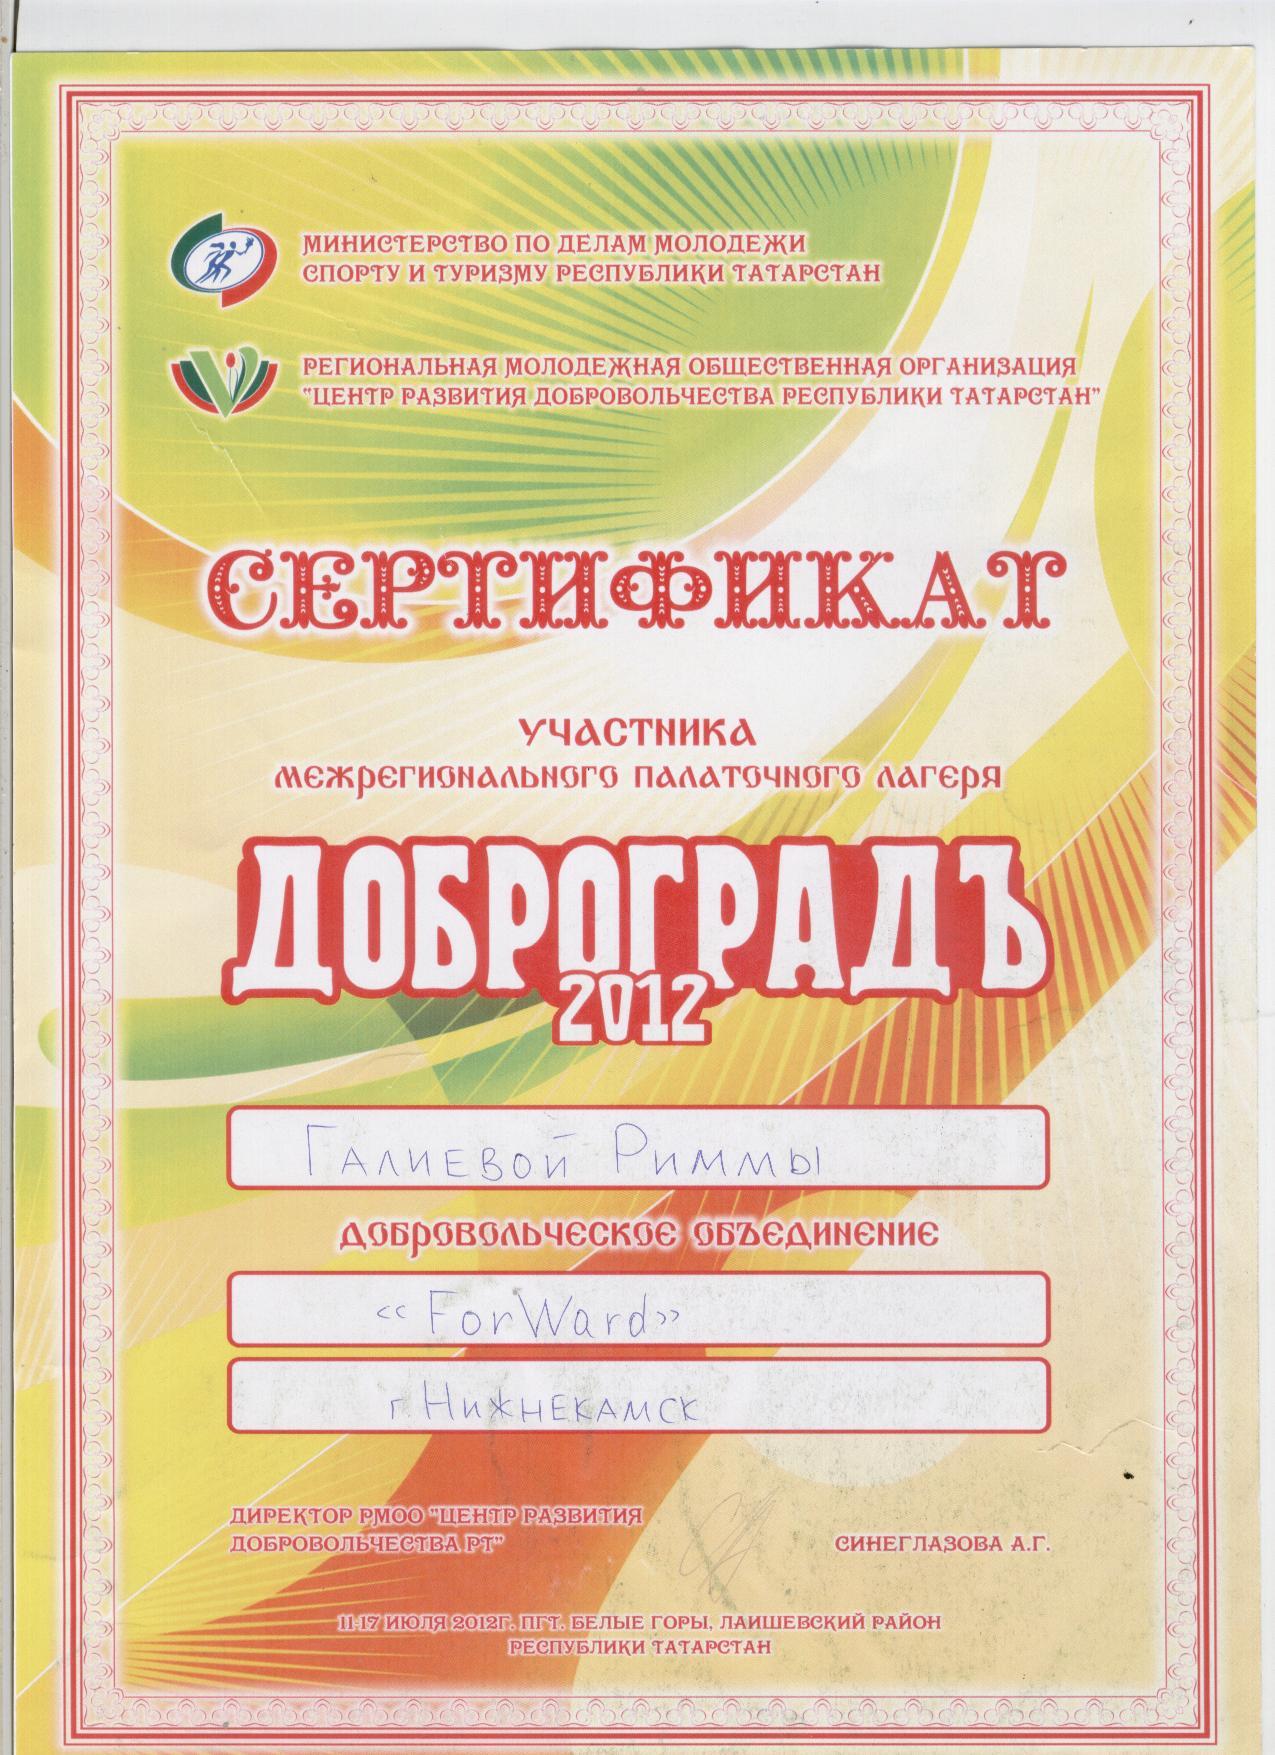 F:\Всероссйский конкурс Портфолио выпускника\РИММА\Римма.jpg